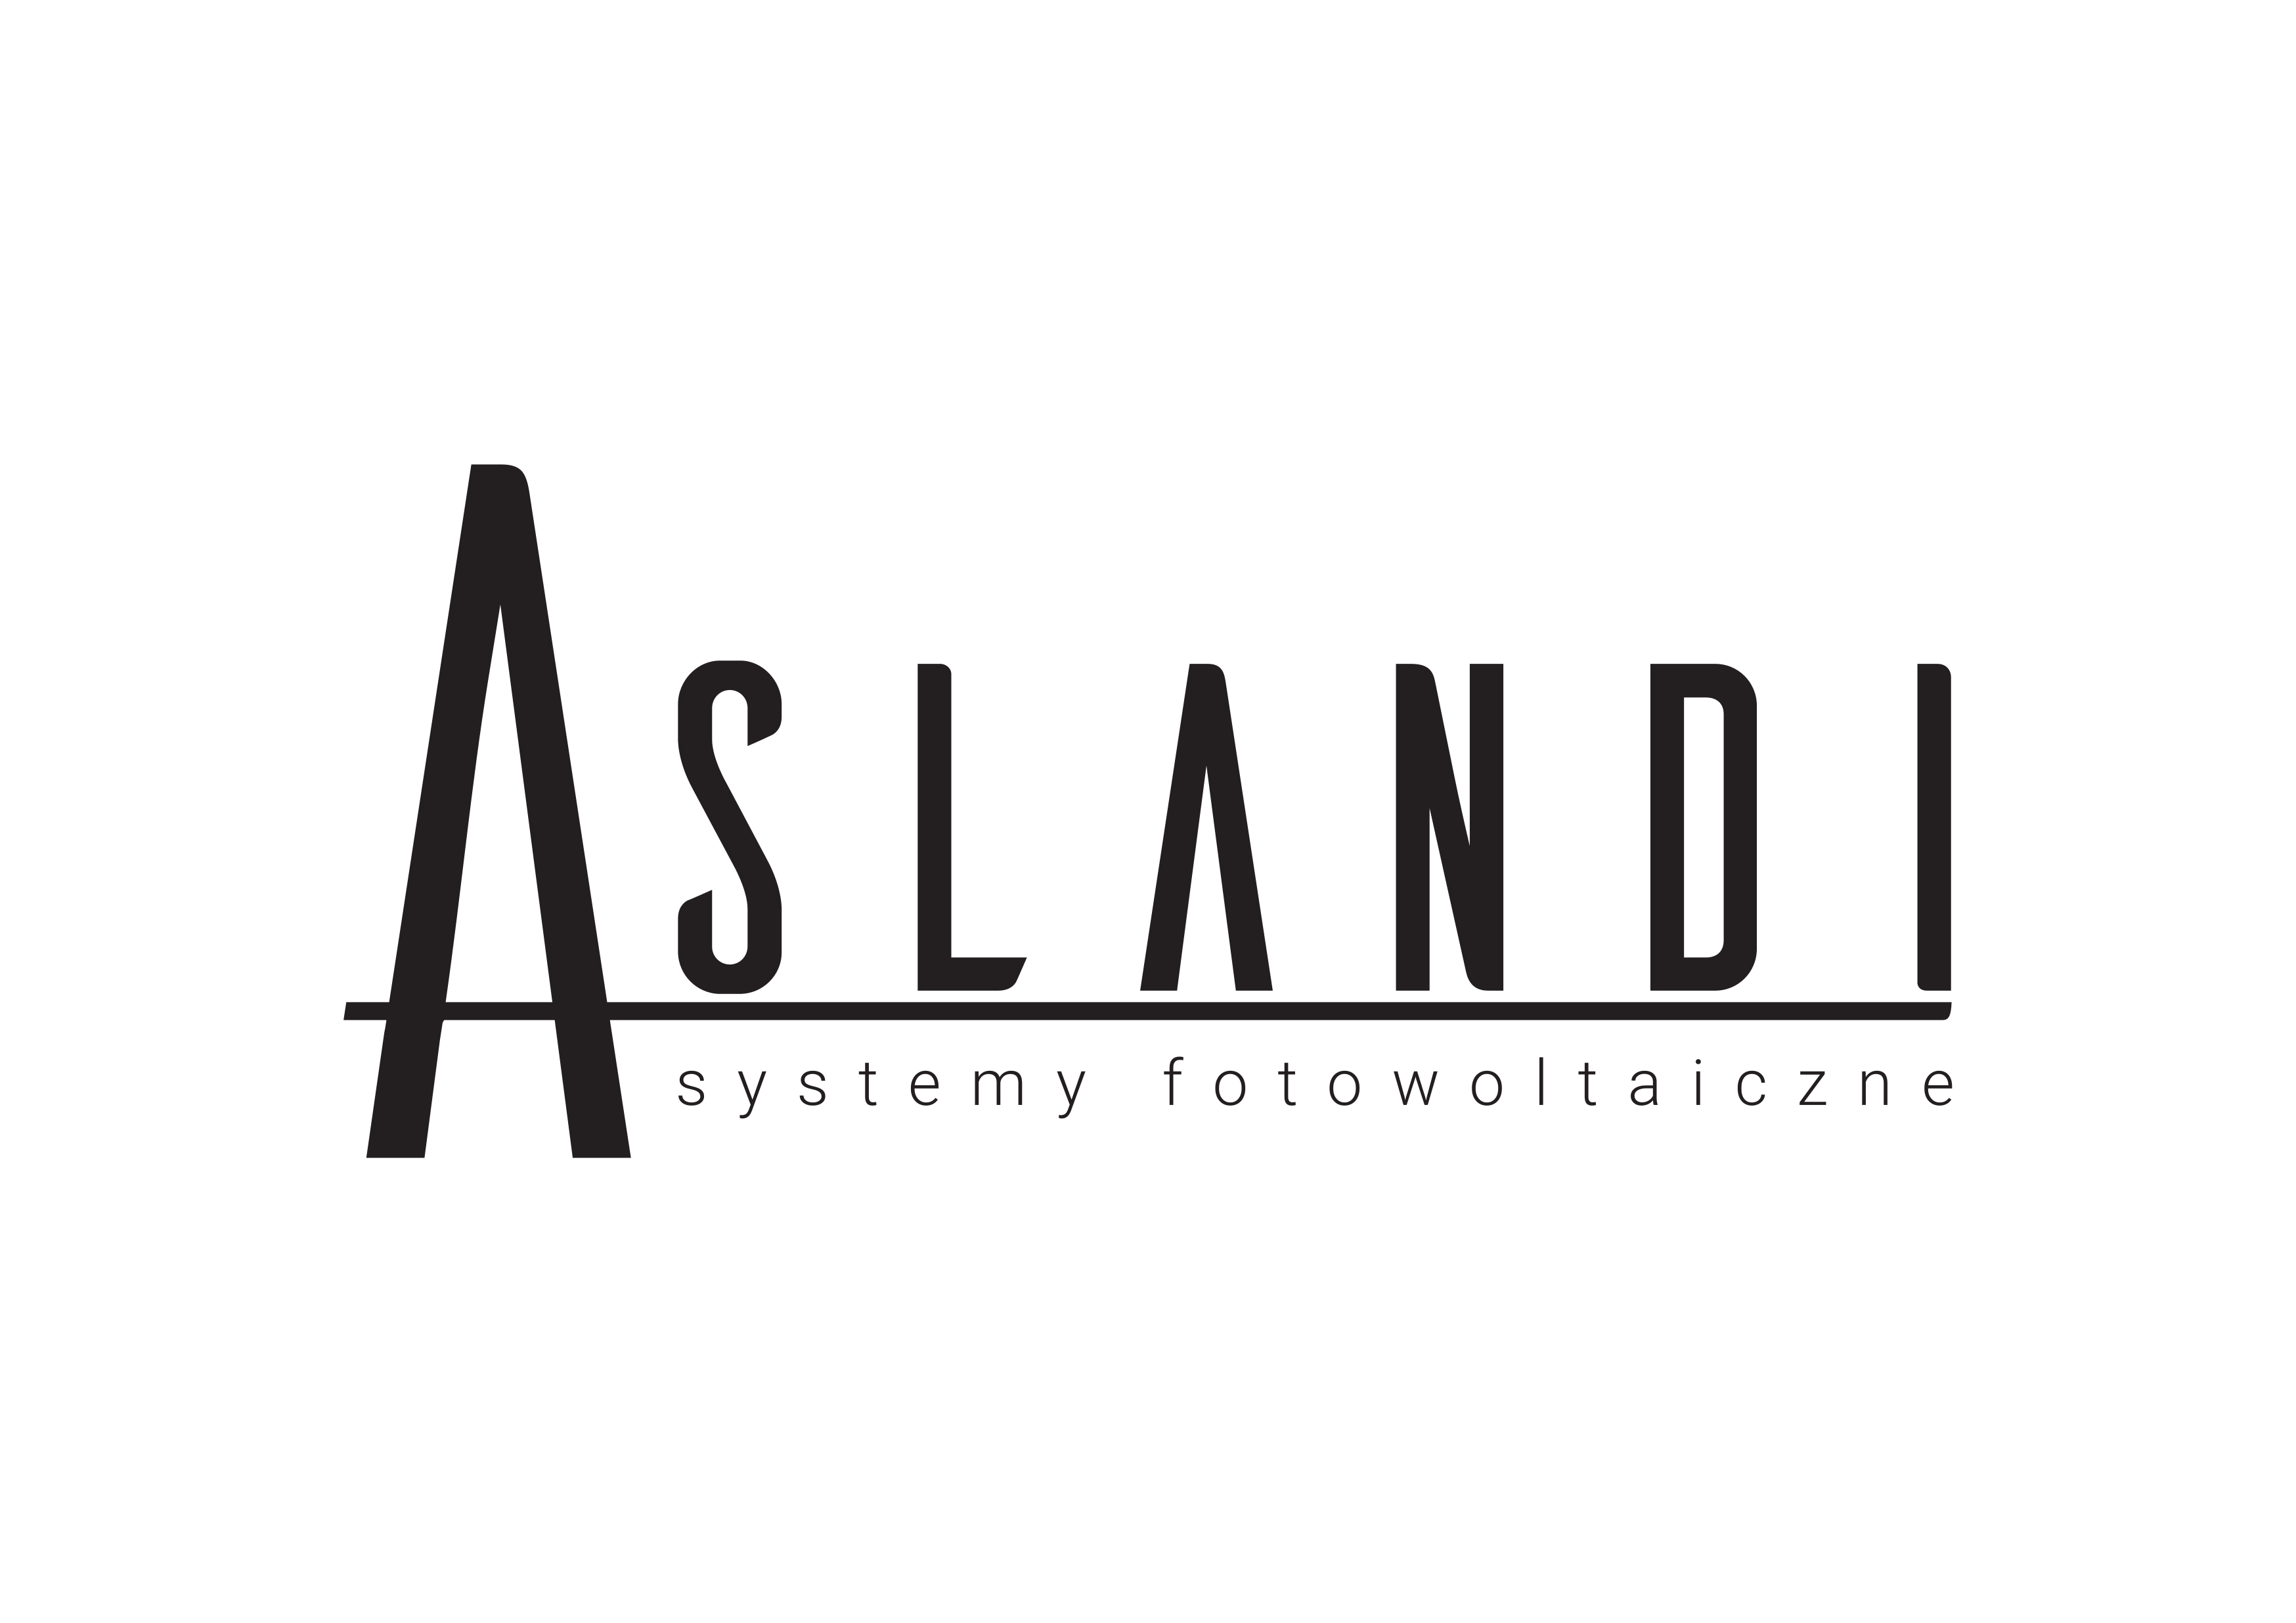 Aslandi